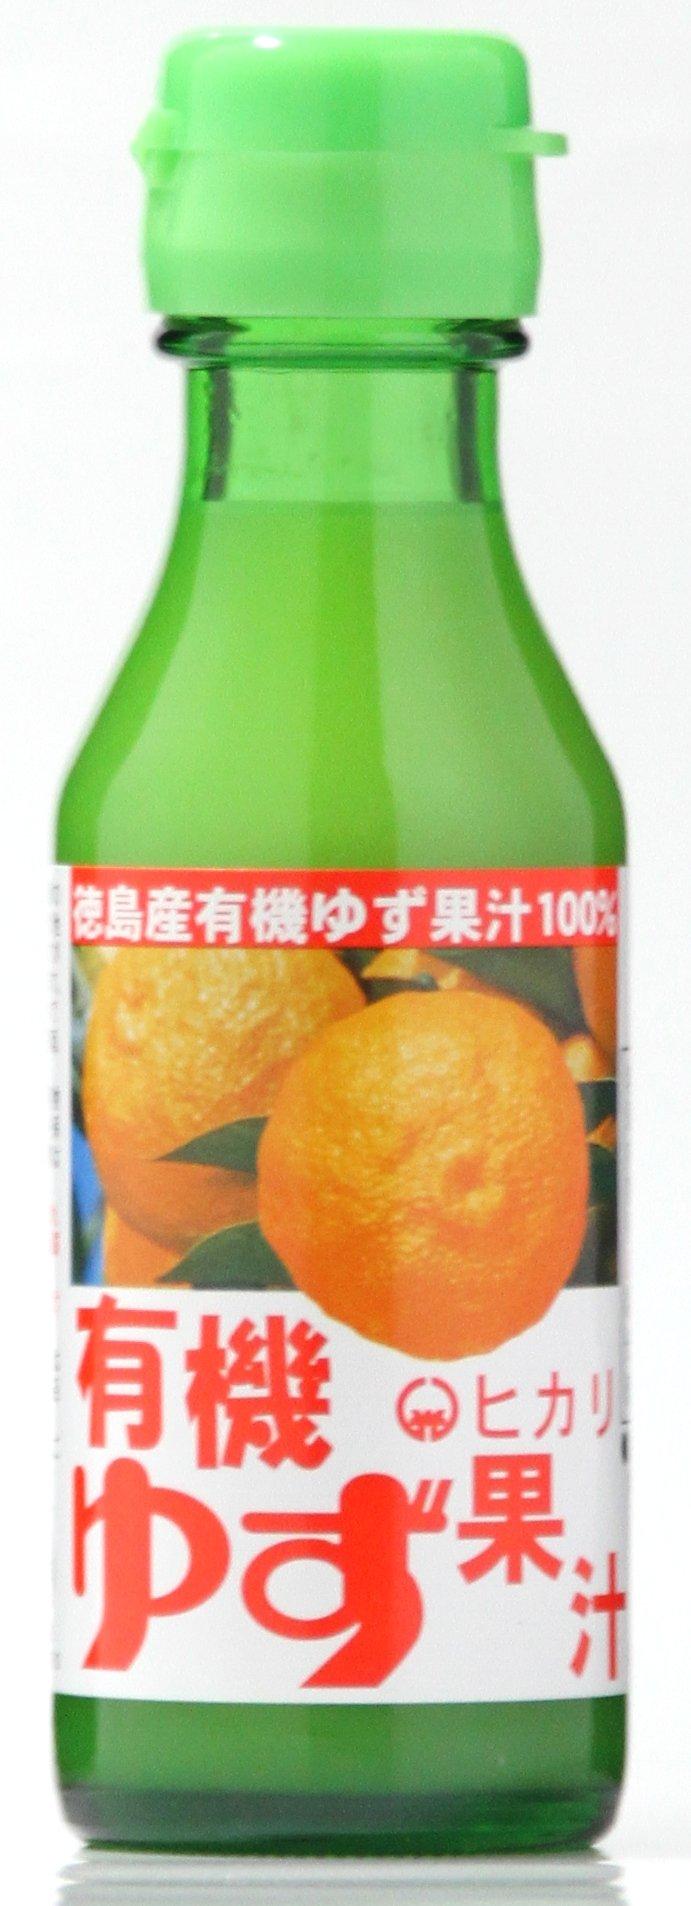 Organic Yuzu Juice - 3.52 Oz